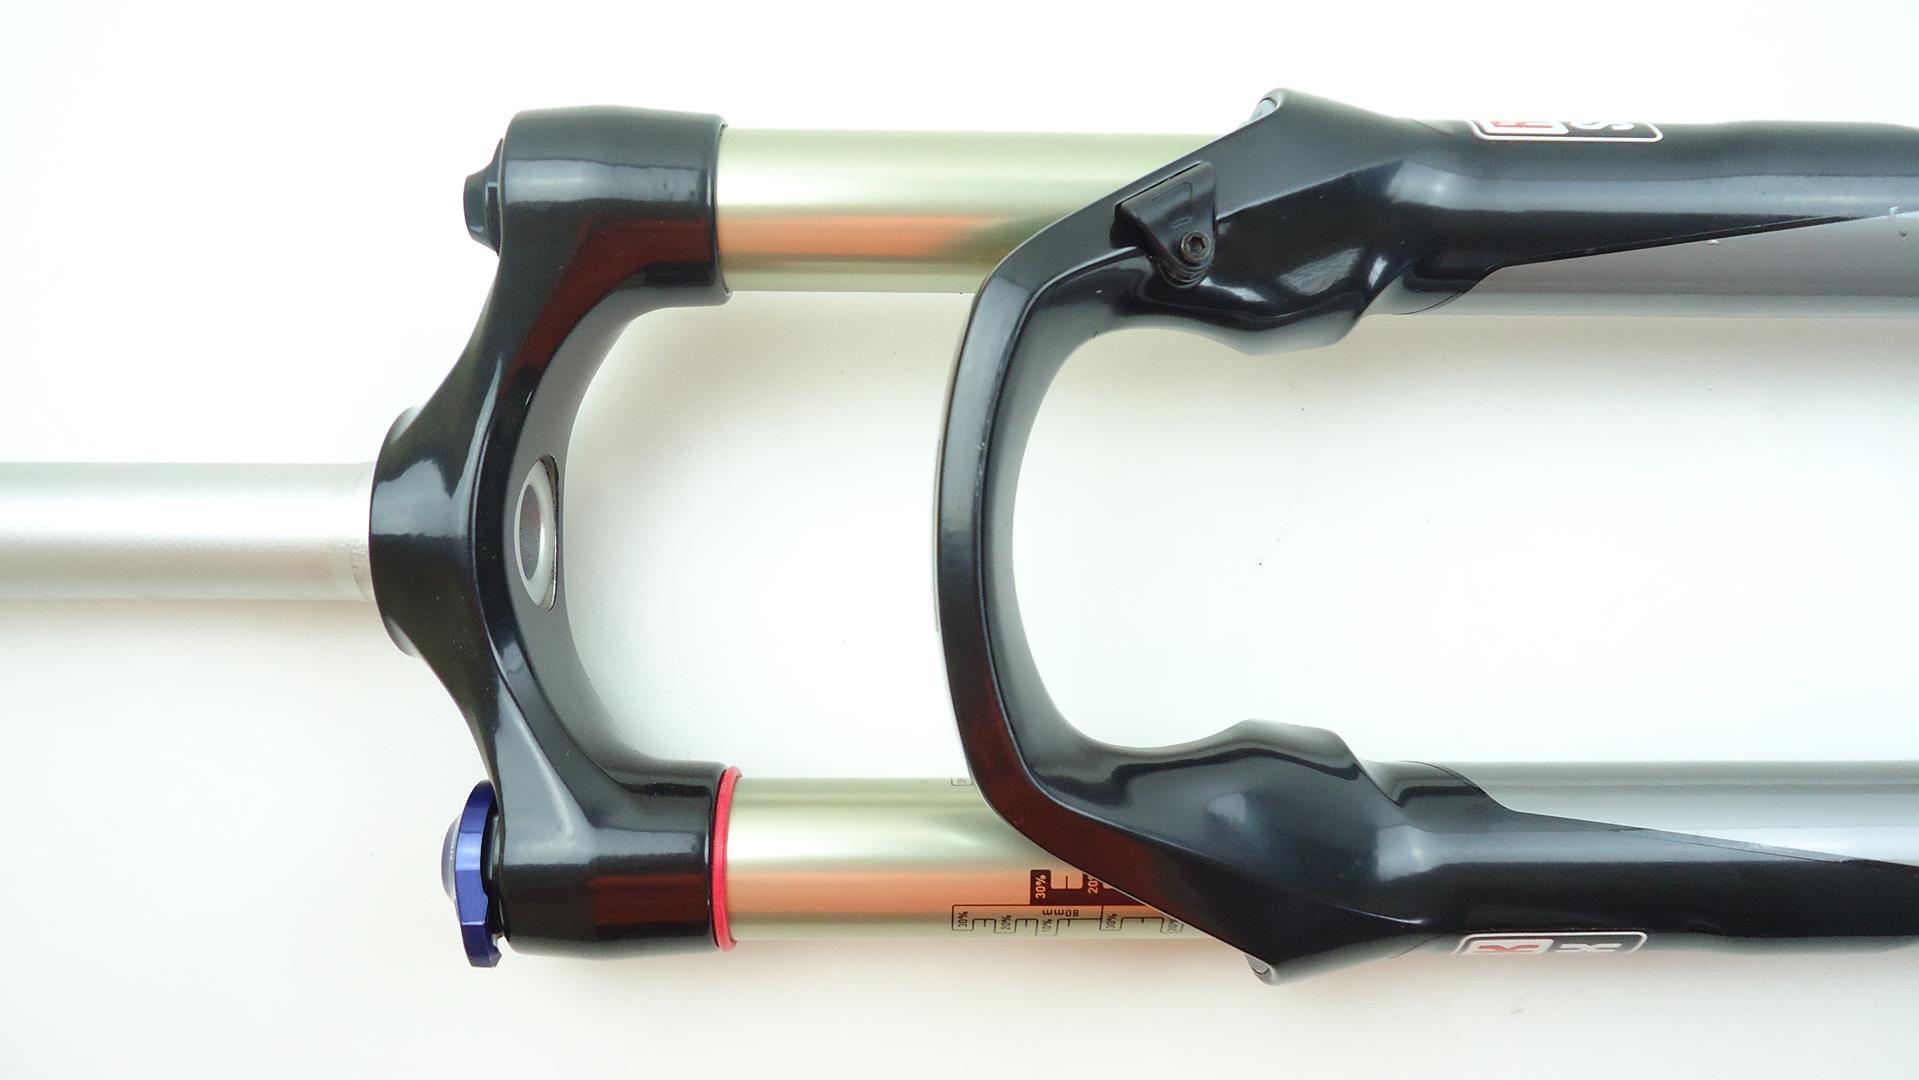 Suspensão Rock Shox Reba RL 29er 100mm Espiga Reta Eixo 9mm Solo Air